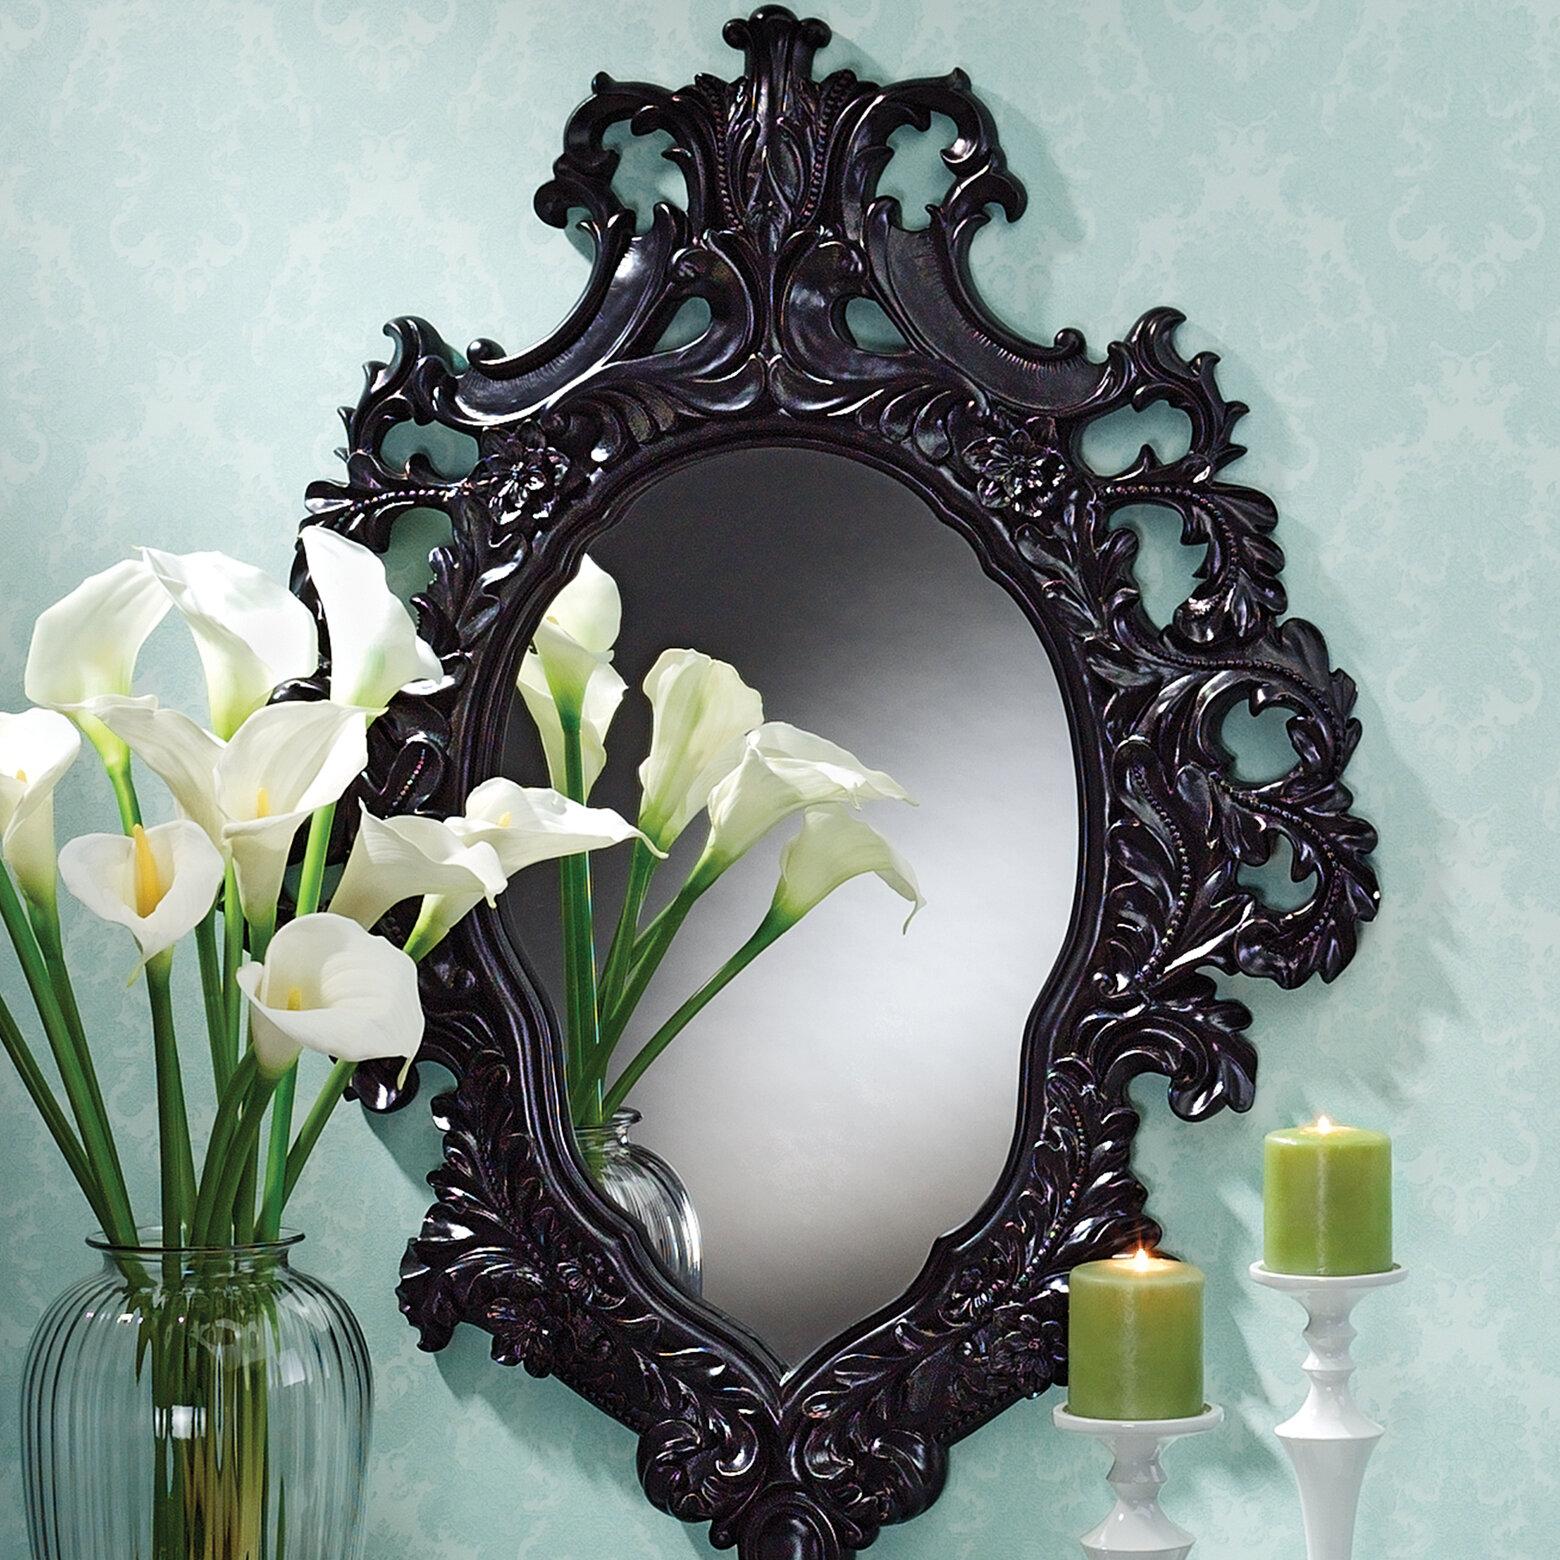 Design Toscano Madame Antoinette Salon Accent Mirror Reviews Wayfair